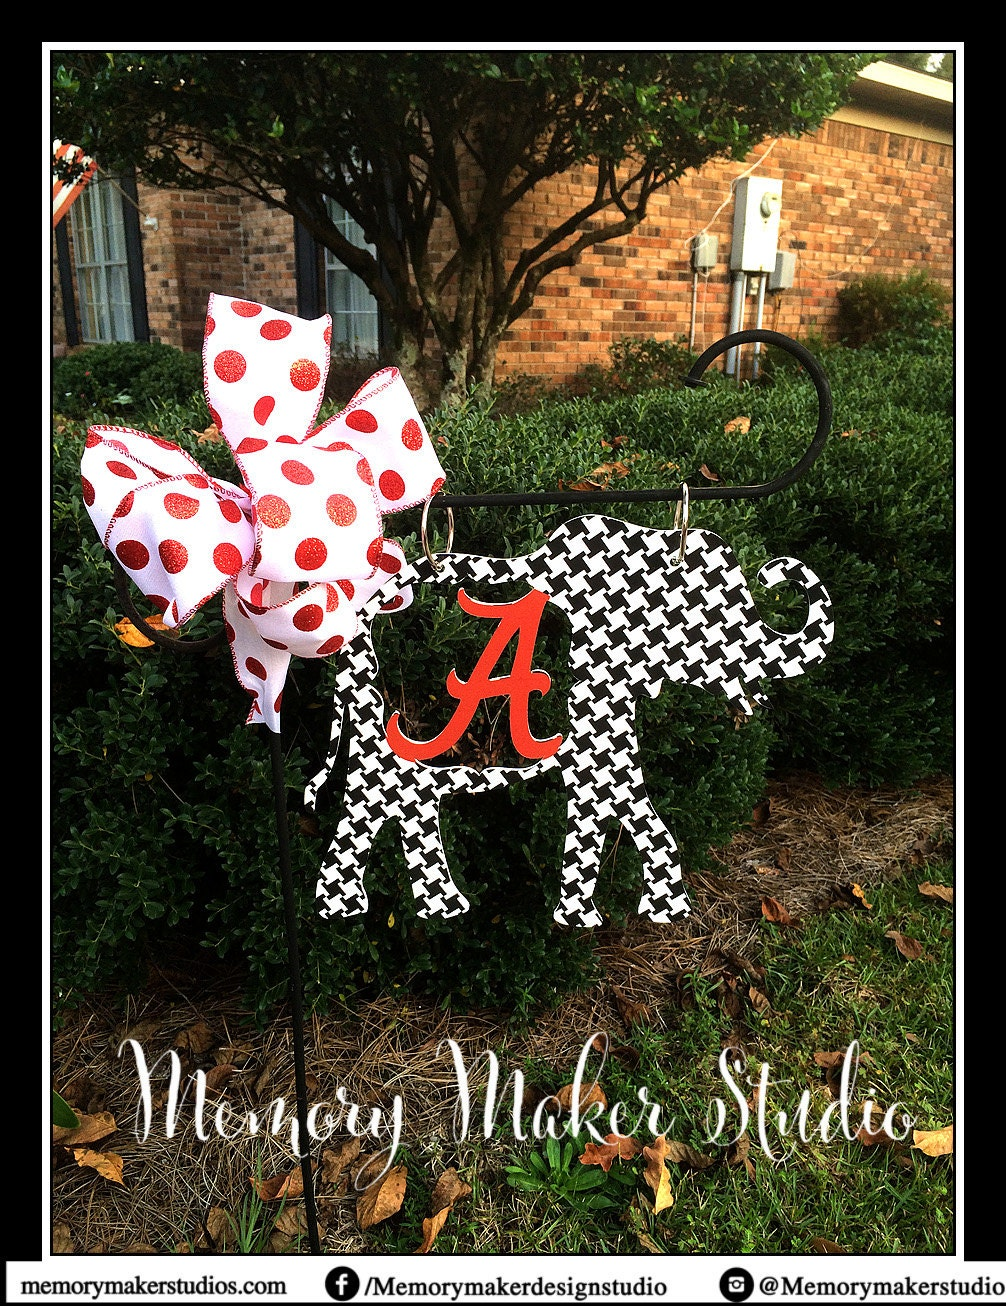 Alabama Houndstooth Elephant Lawn and Garden Flag Houndstooth